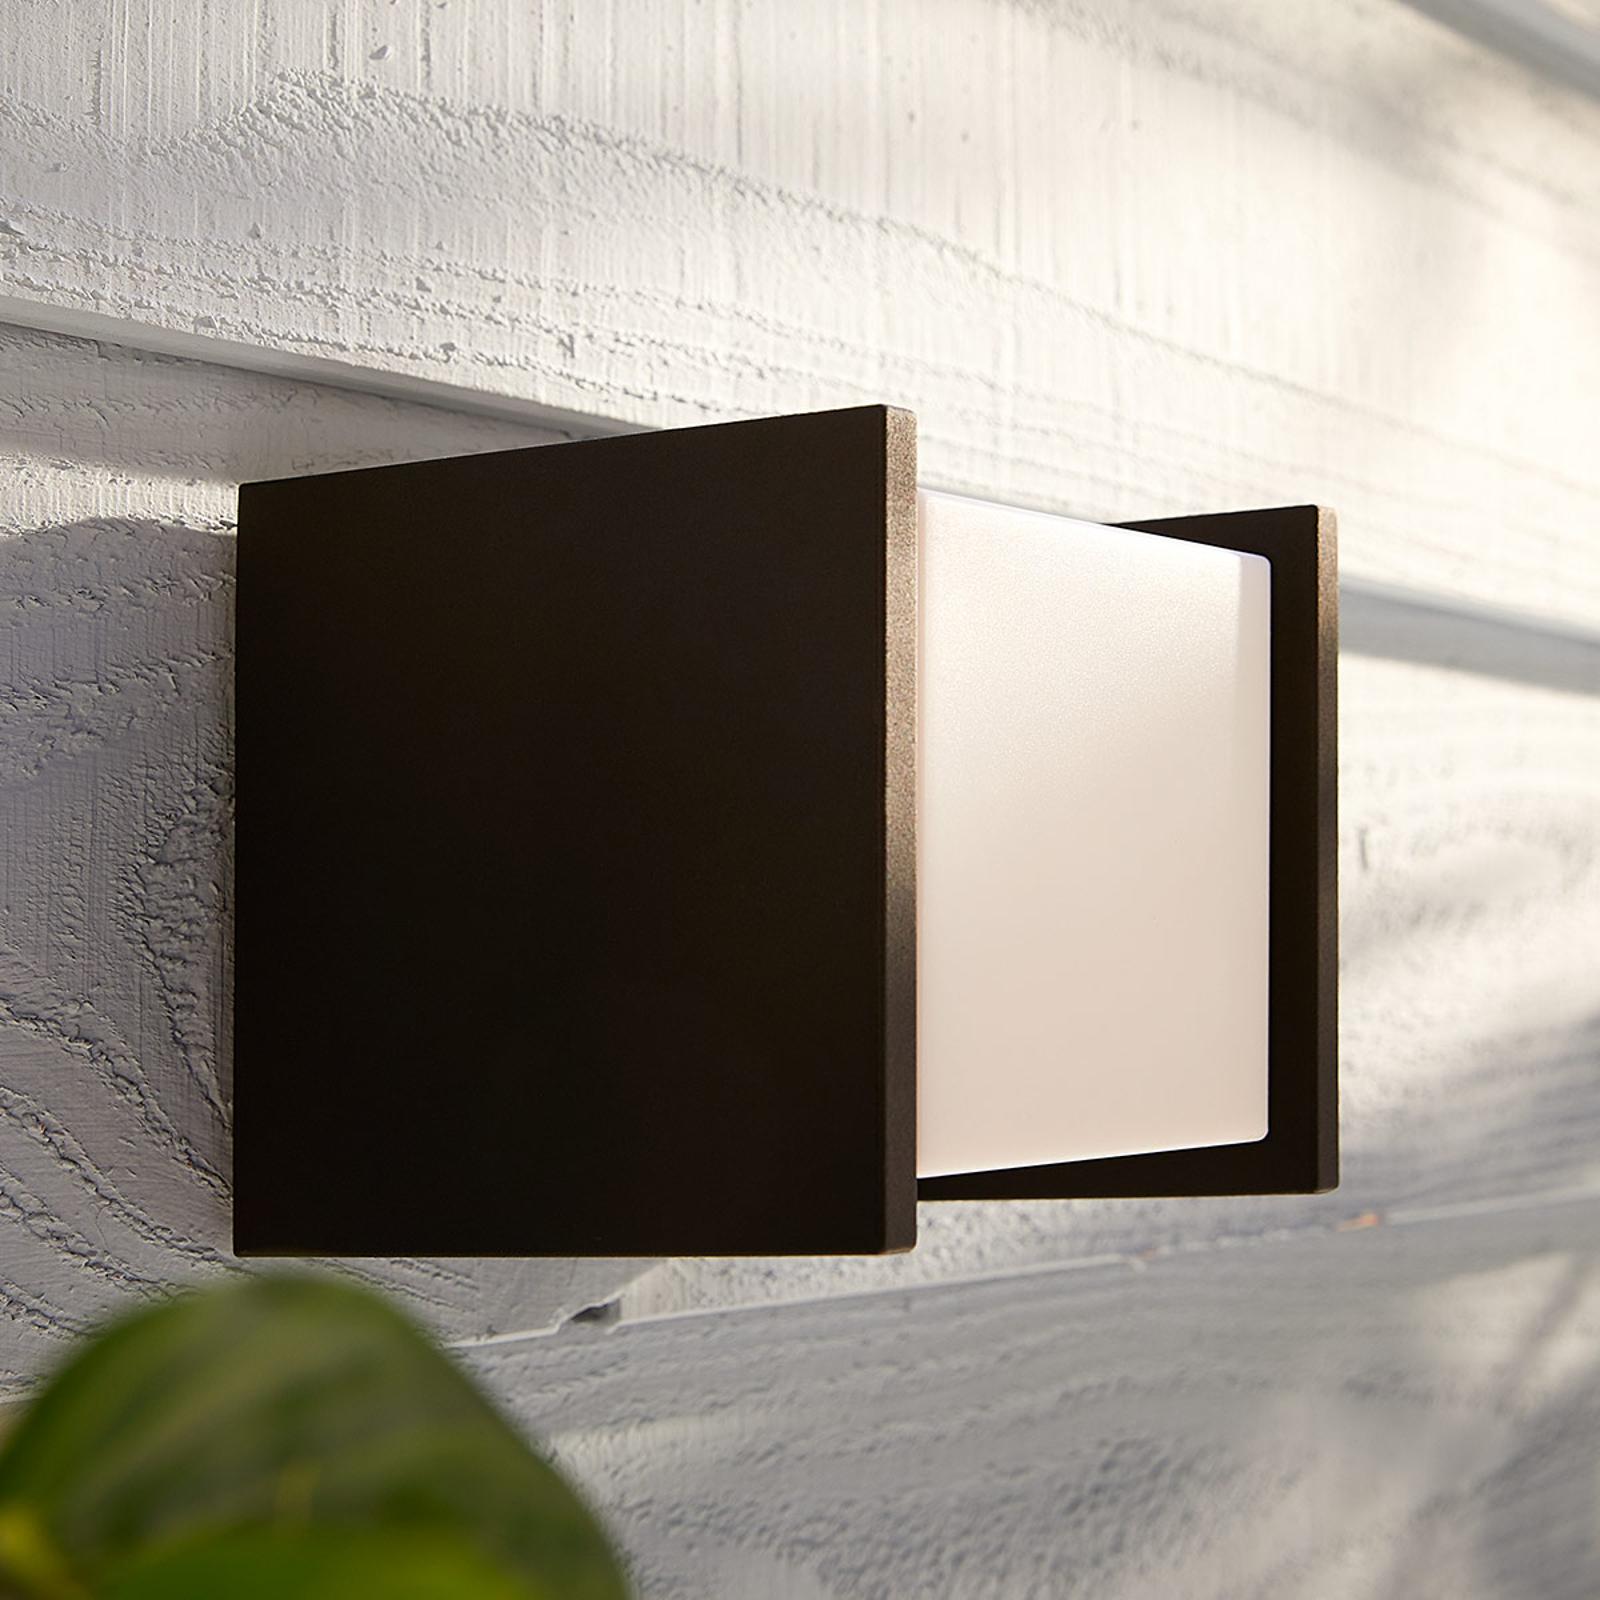 Philips Hue White Fuzo udendørsvæglampe, 13x14cm